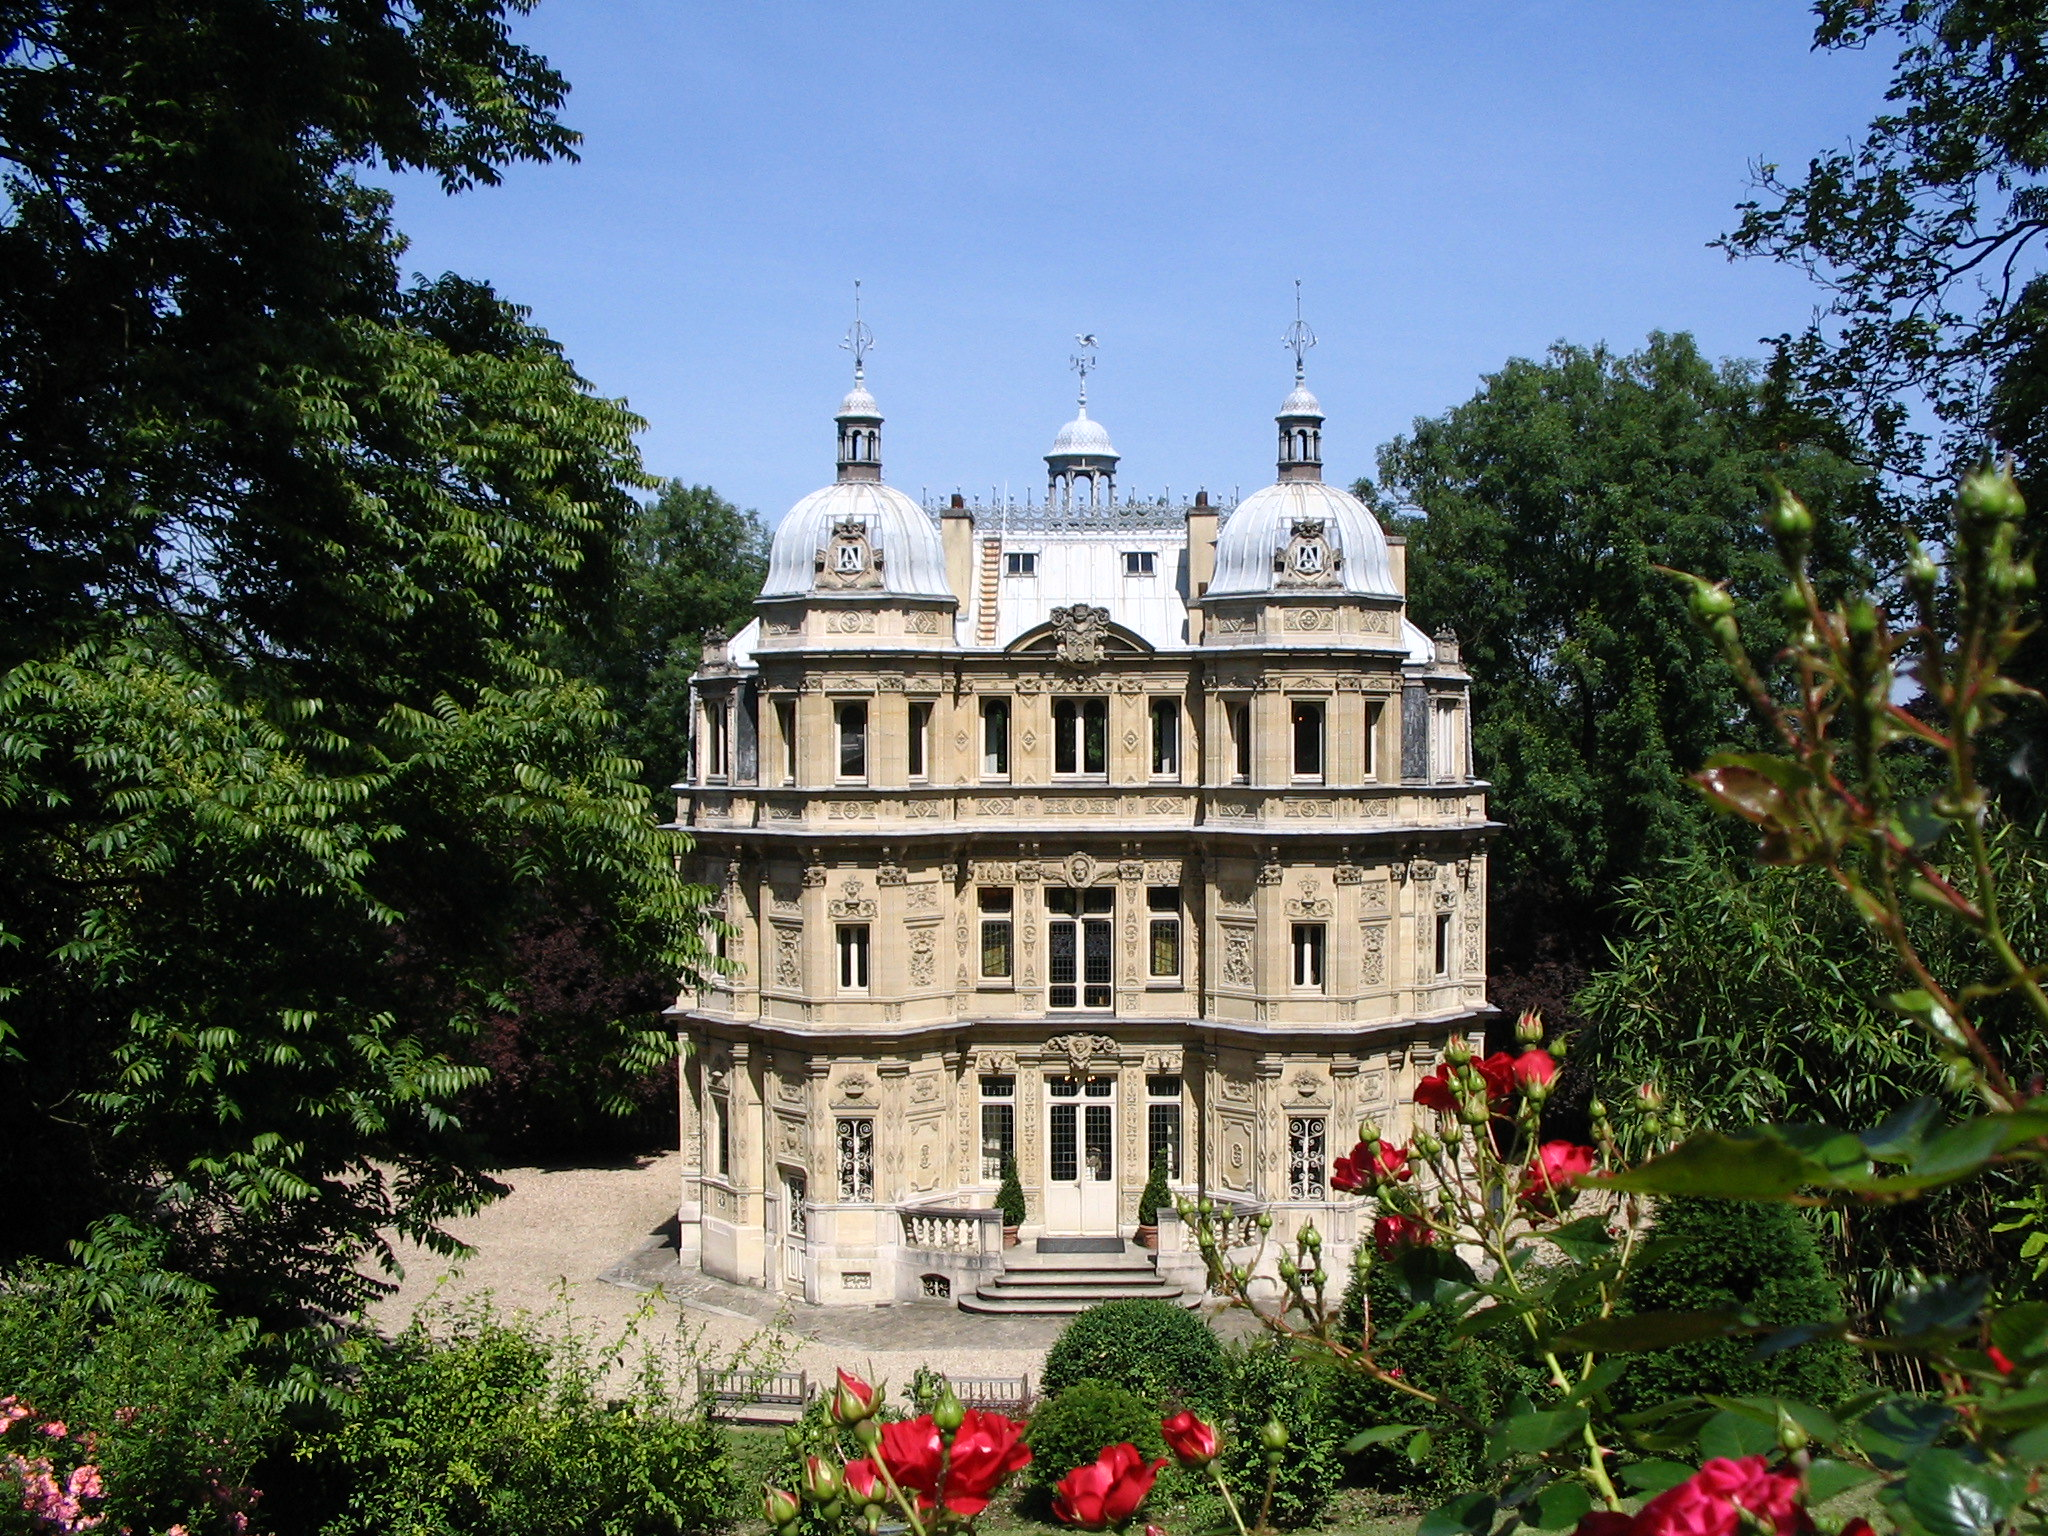 Chateau de Monte-Cristo © CD78 / N.Duprey